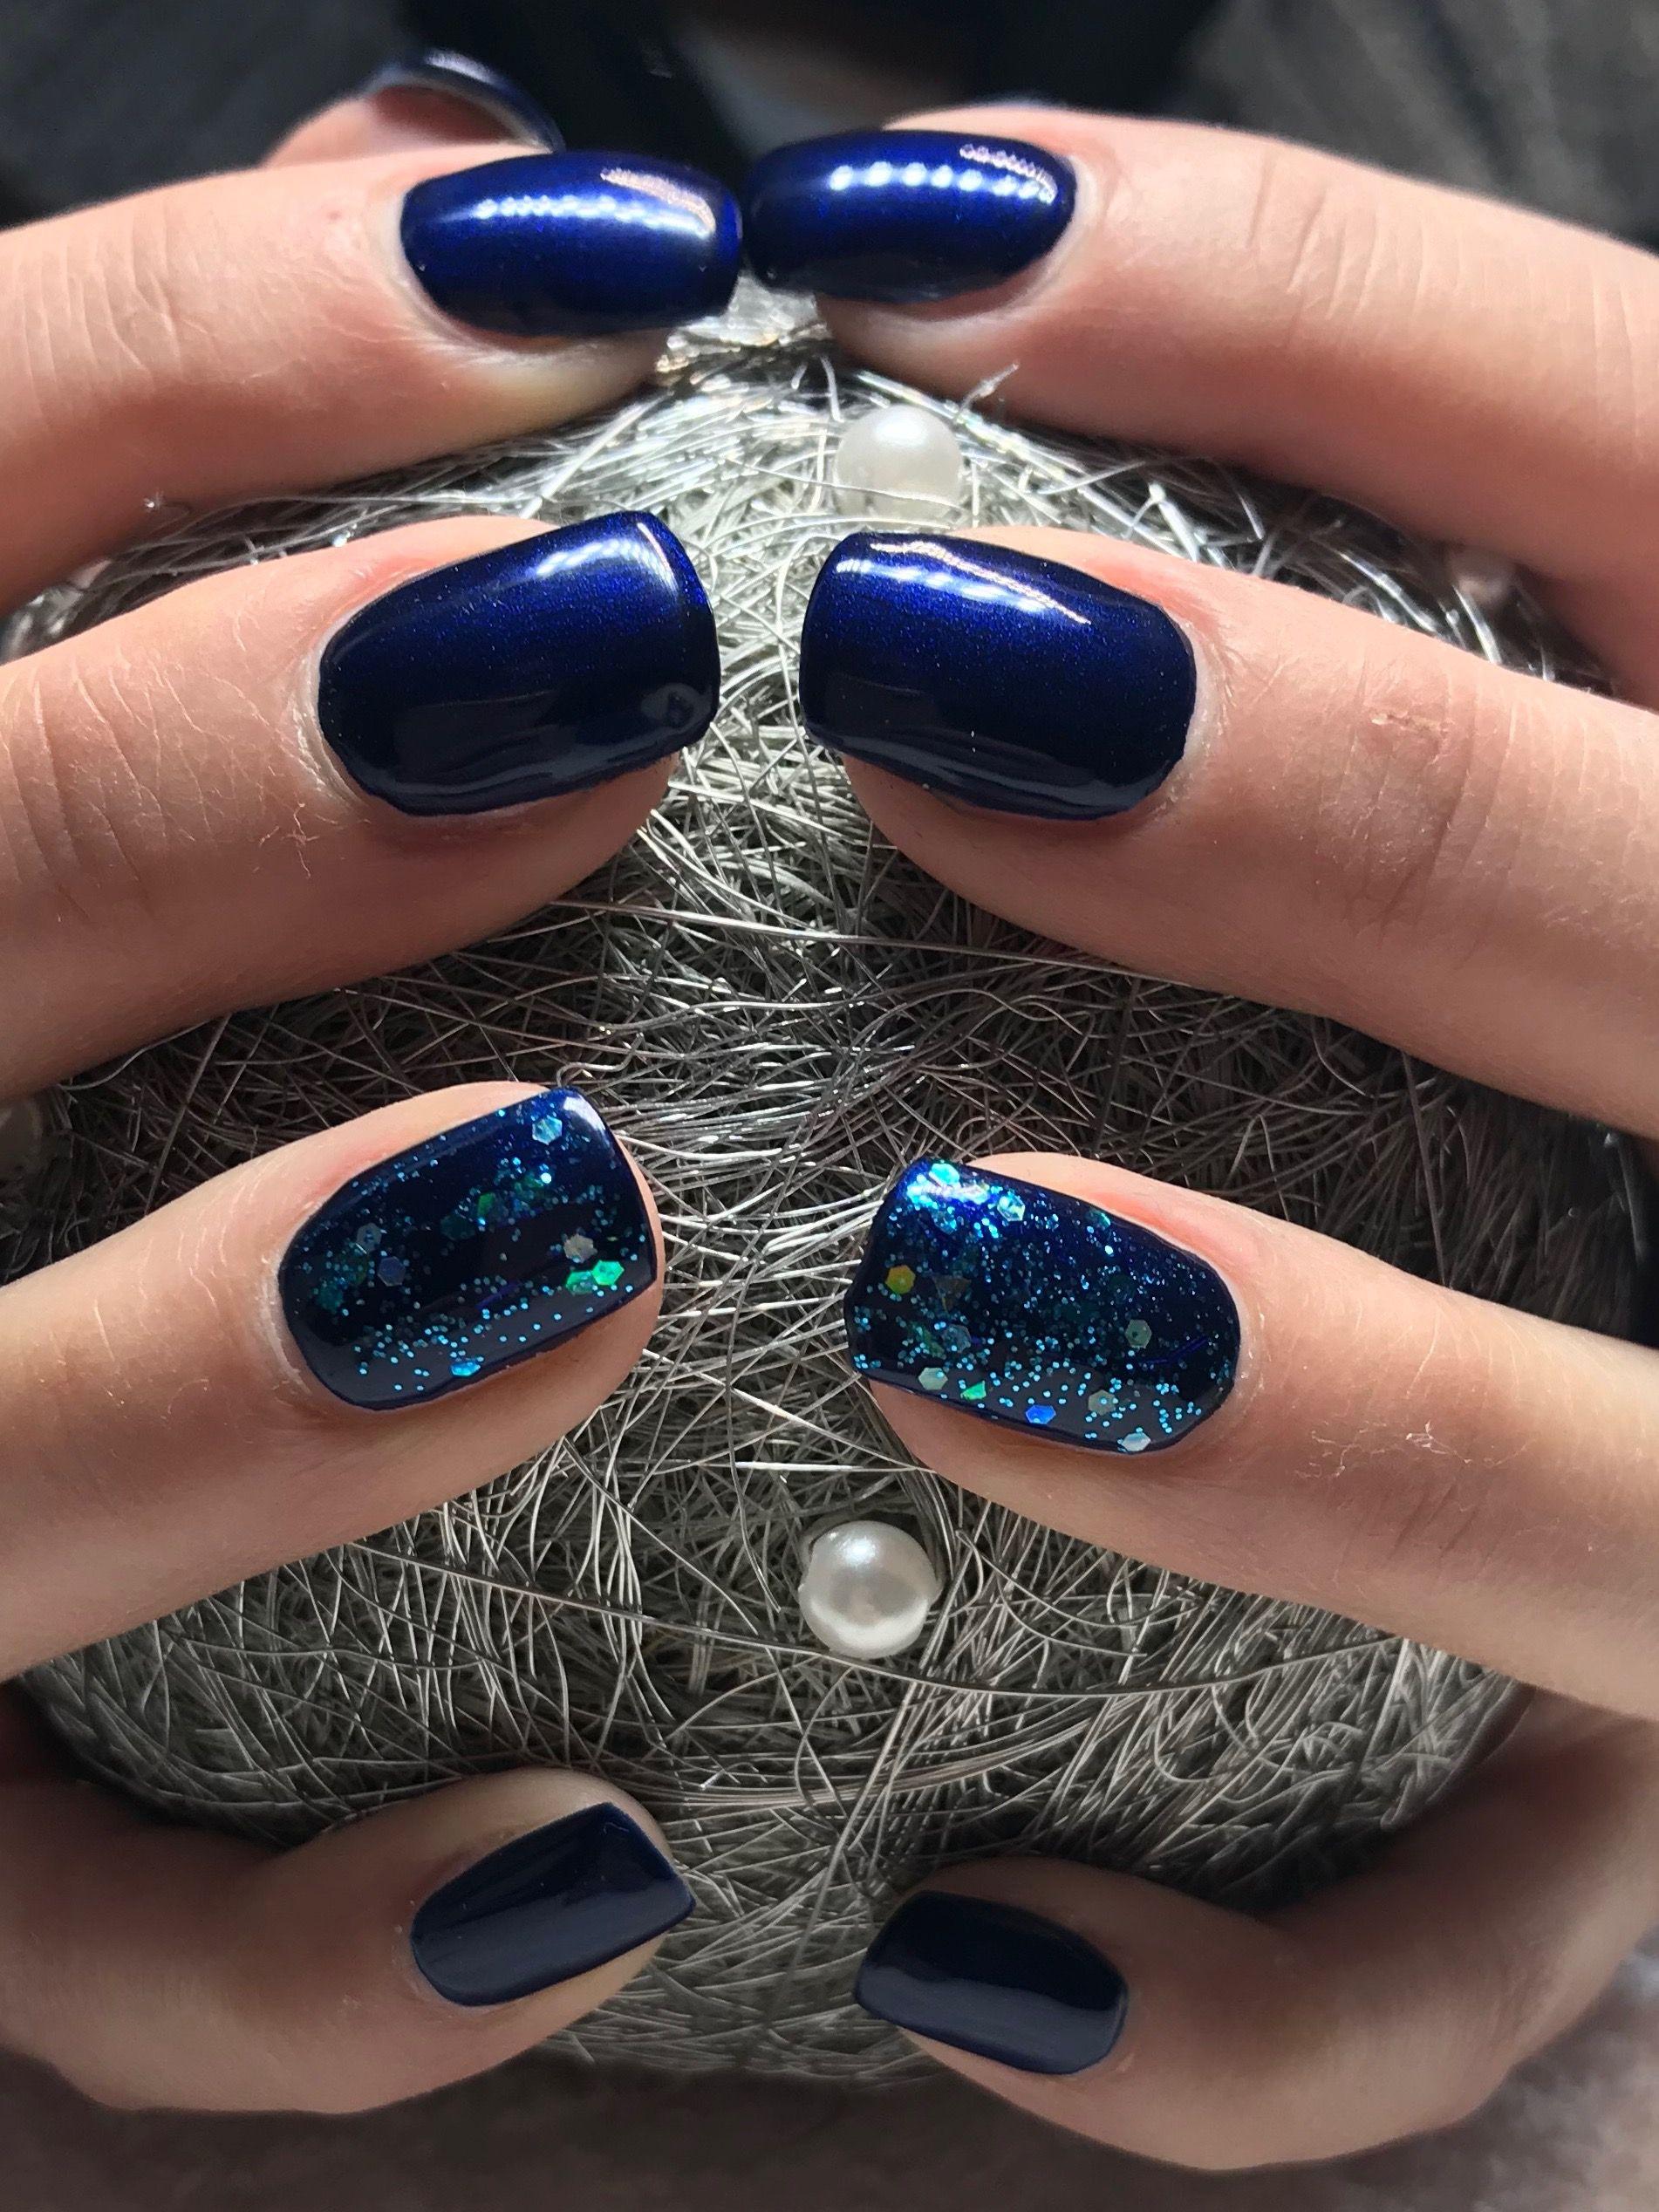 Pin van Carmen Estrada op Get Nailed | Pinterest - Nagel, Mooie ...